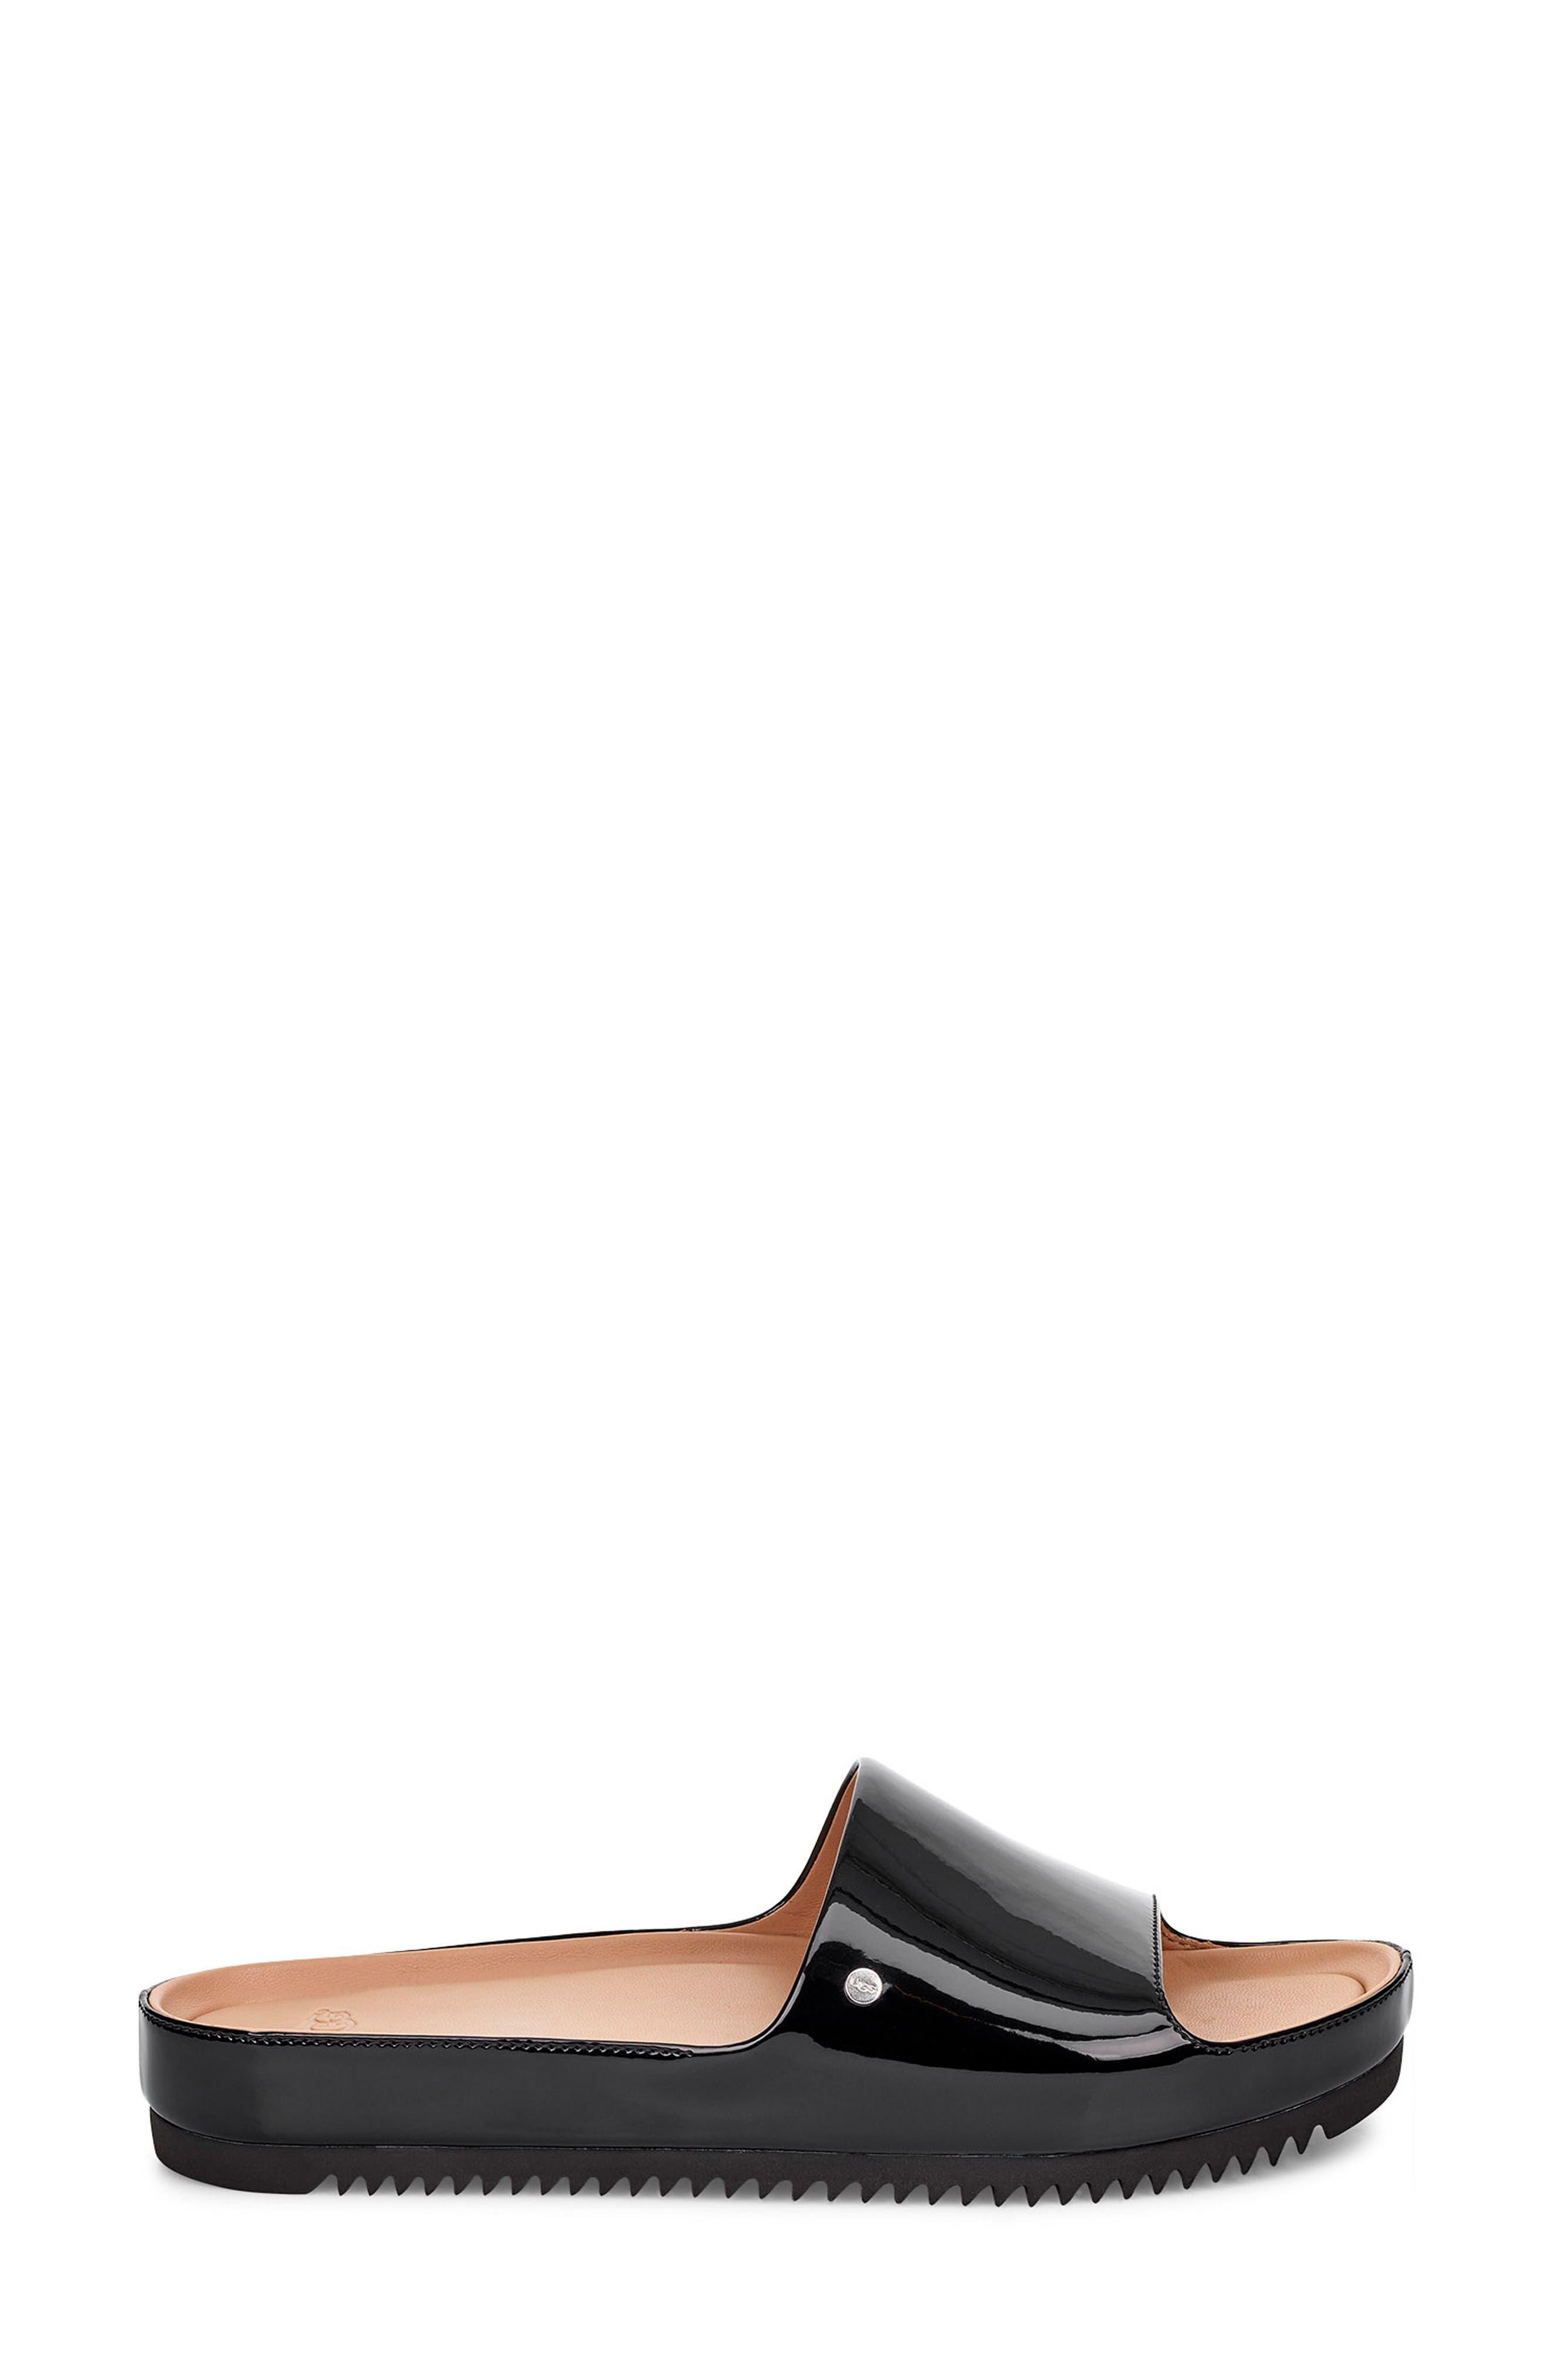 Jane Platform Slide Sandal,                             Alternate thumbnail 3, color,                             BLACK PATENT LEATHER